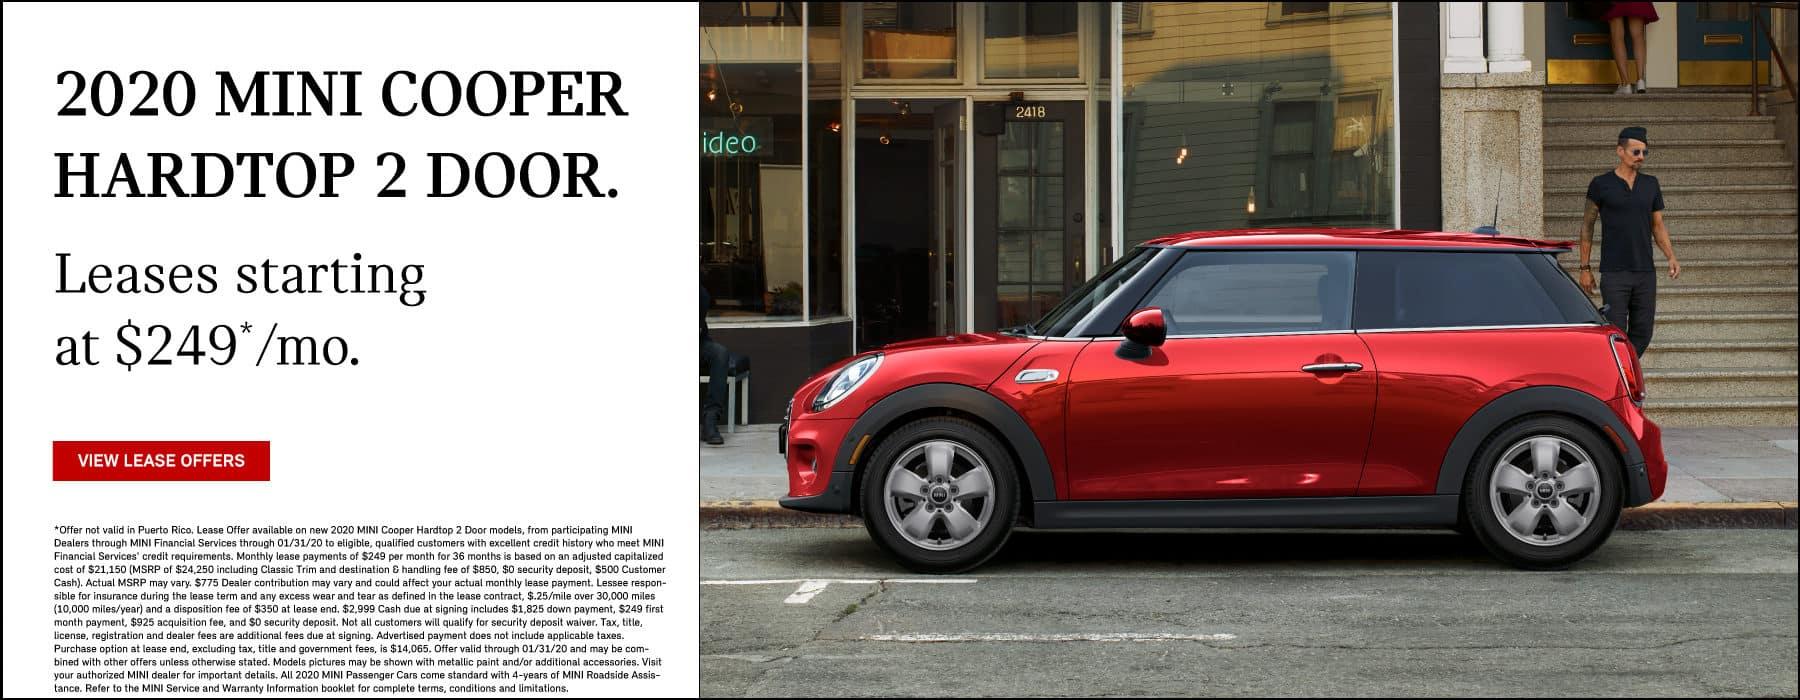 2020 MINI Cooper Hardtop 2 Door. Lease for $249 per month. View Specias. Red MINI Cooper Hardtop 2 door parked on side of the road.